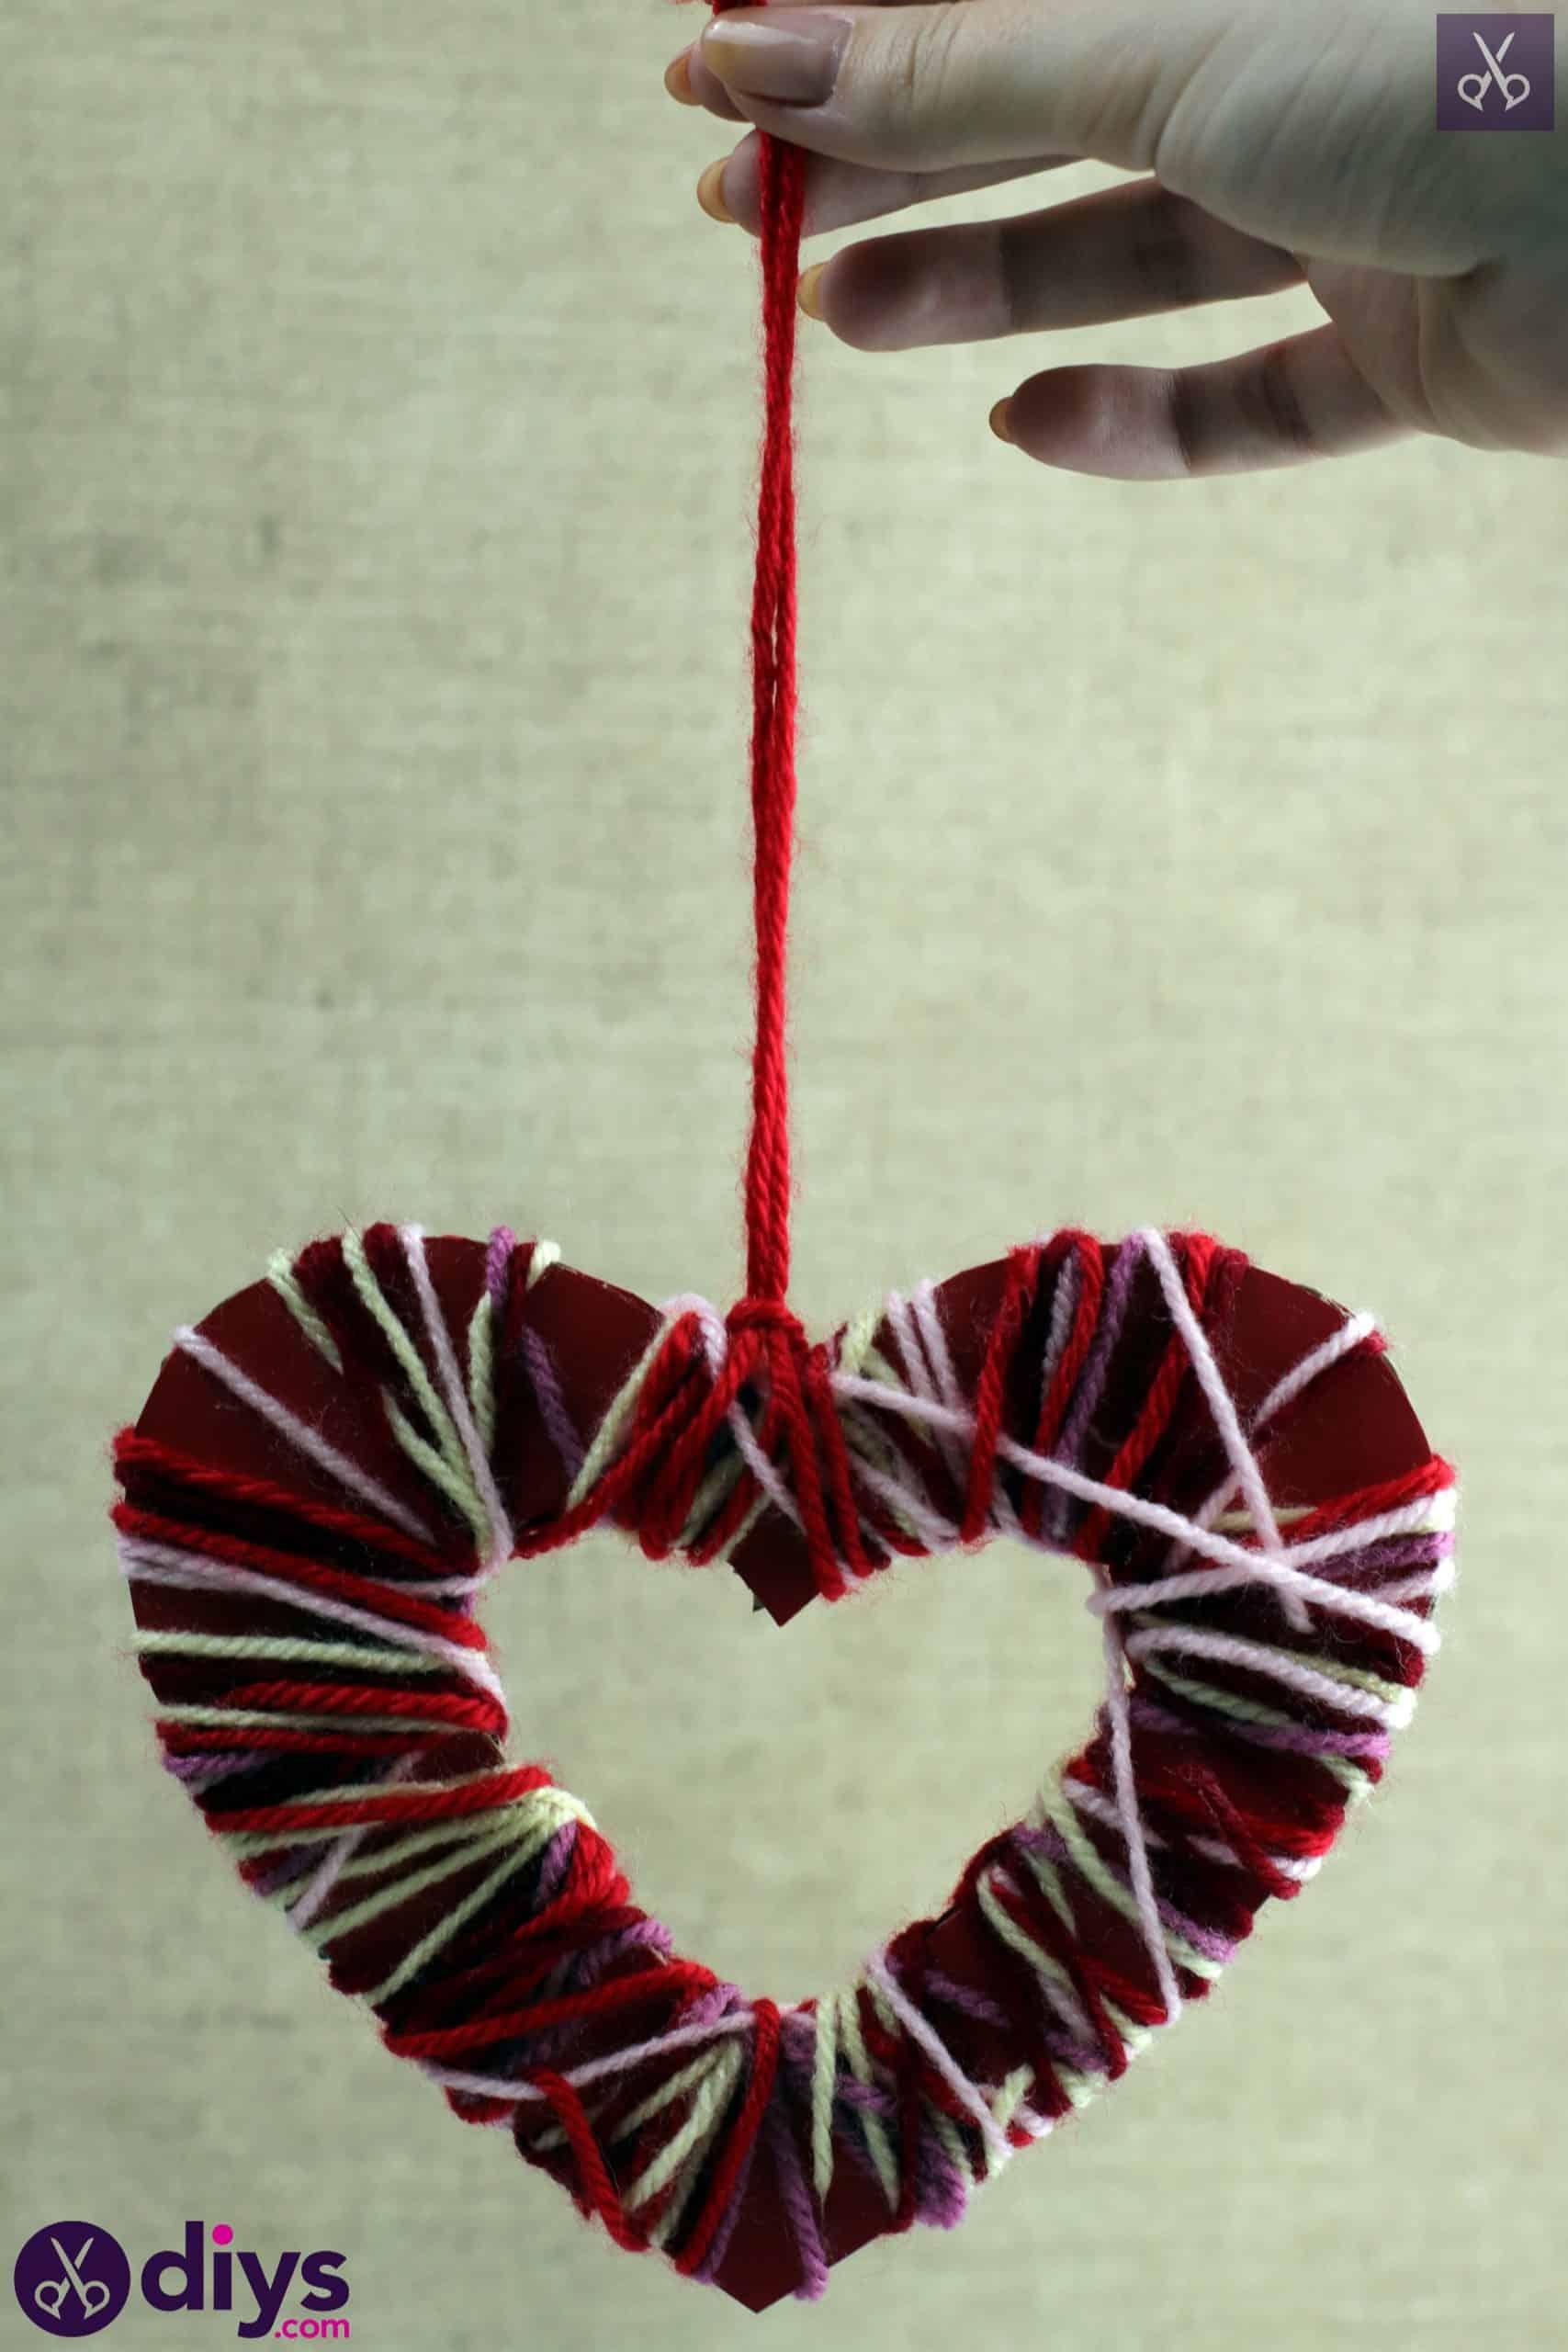 Diy yarn wrapped paper heart hang